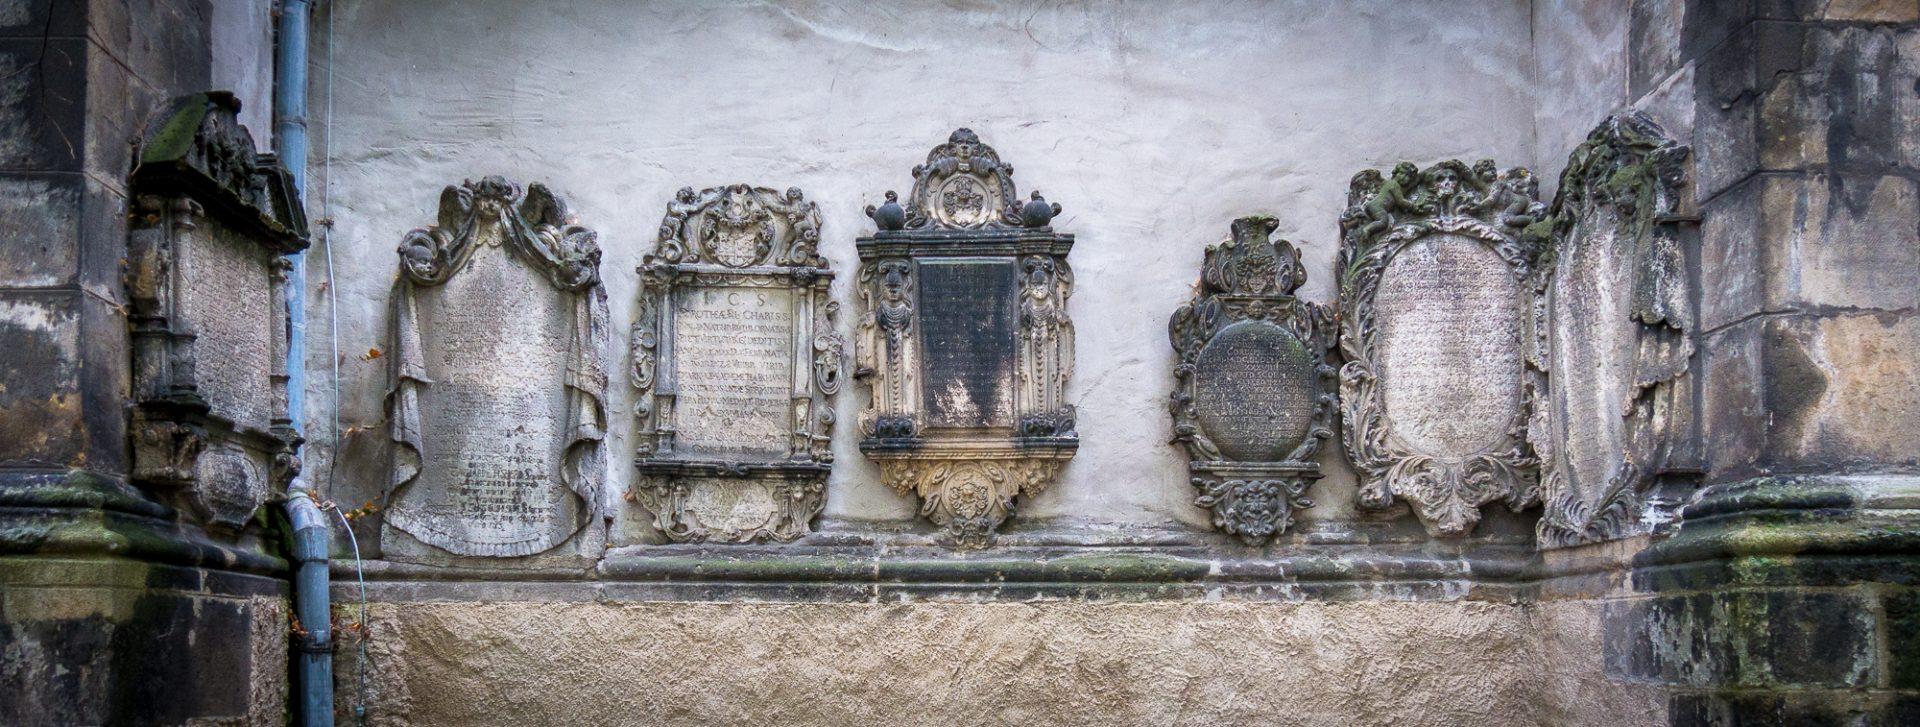 St. Nicholas tombstones